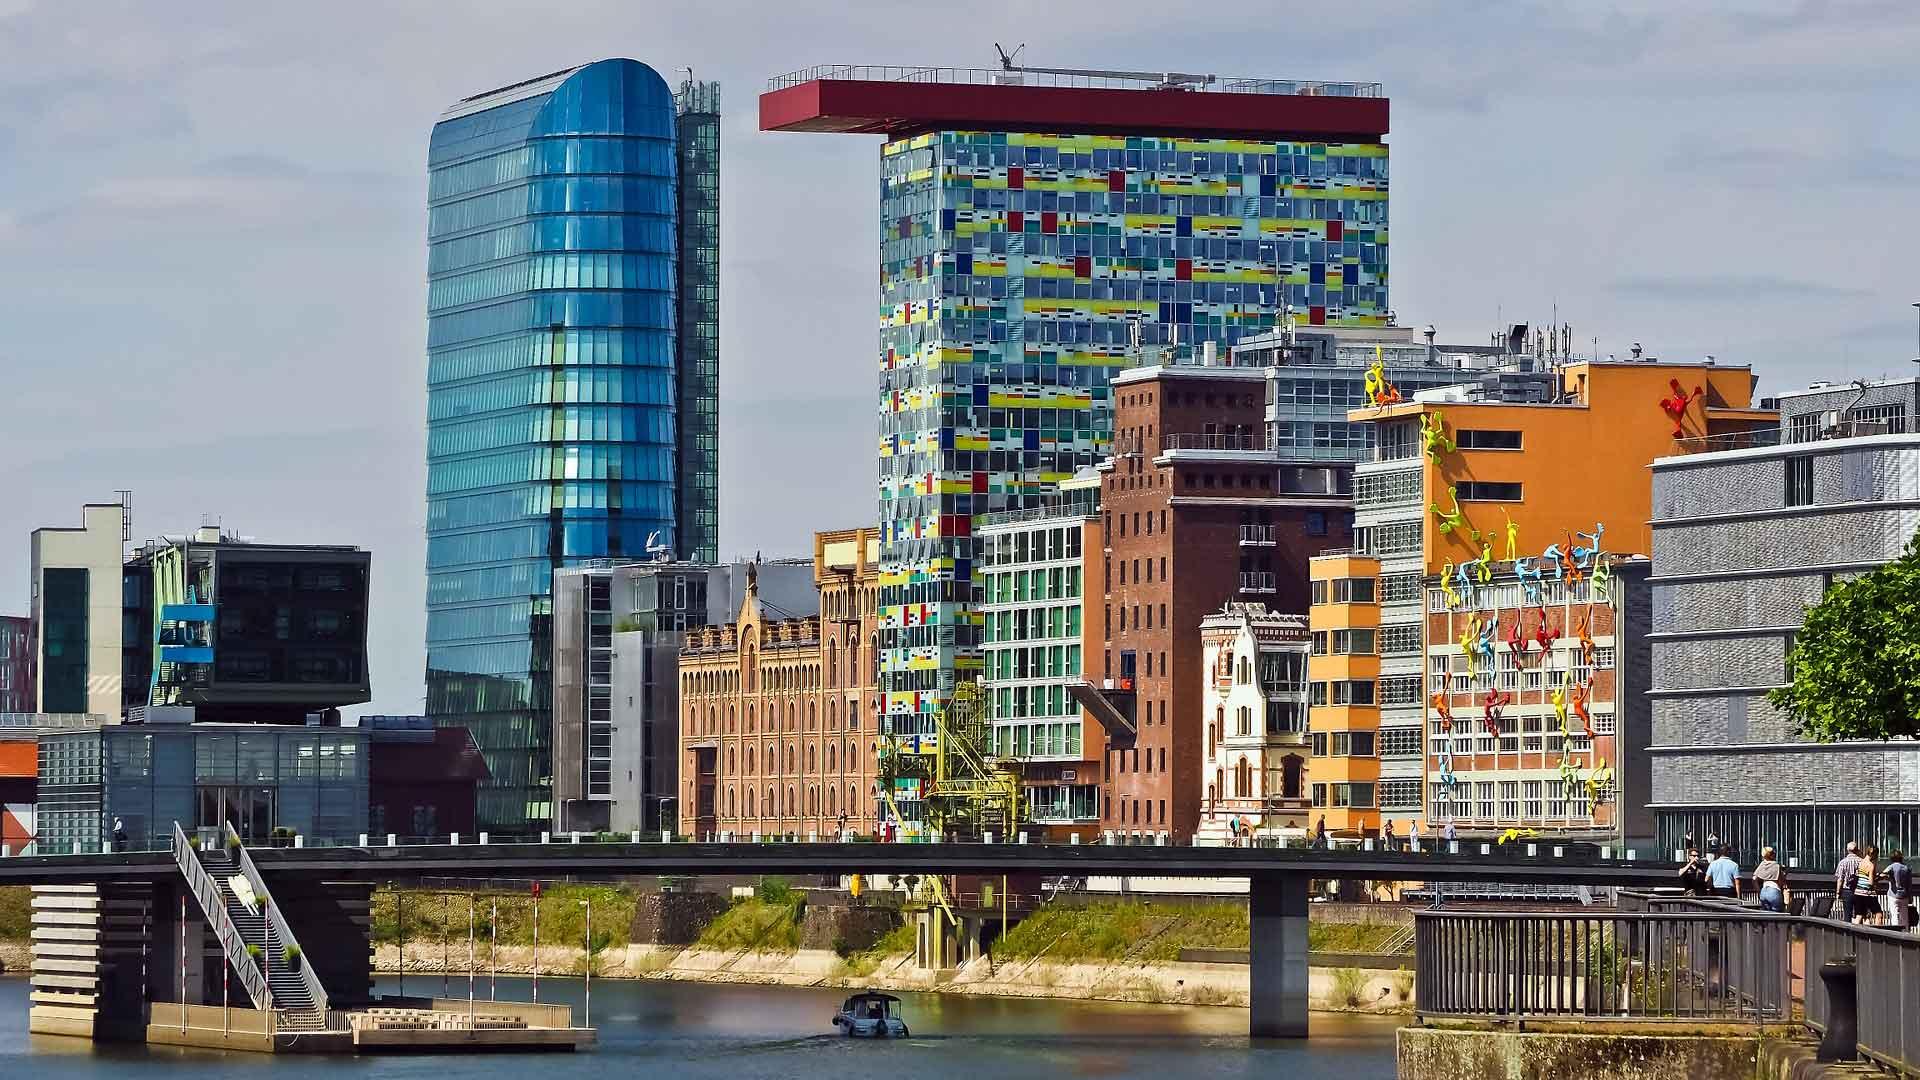 Markante gebouwen in de Medienhafen in Düsseldorf.